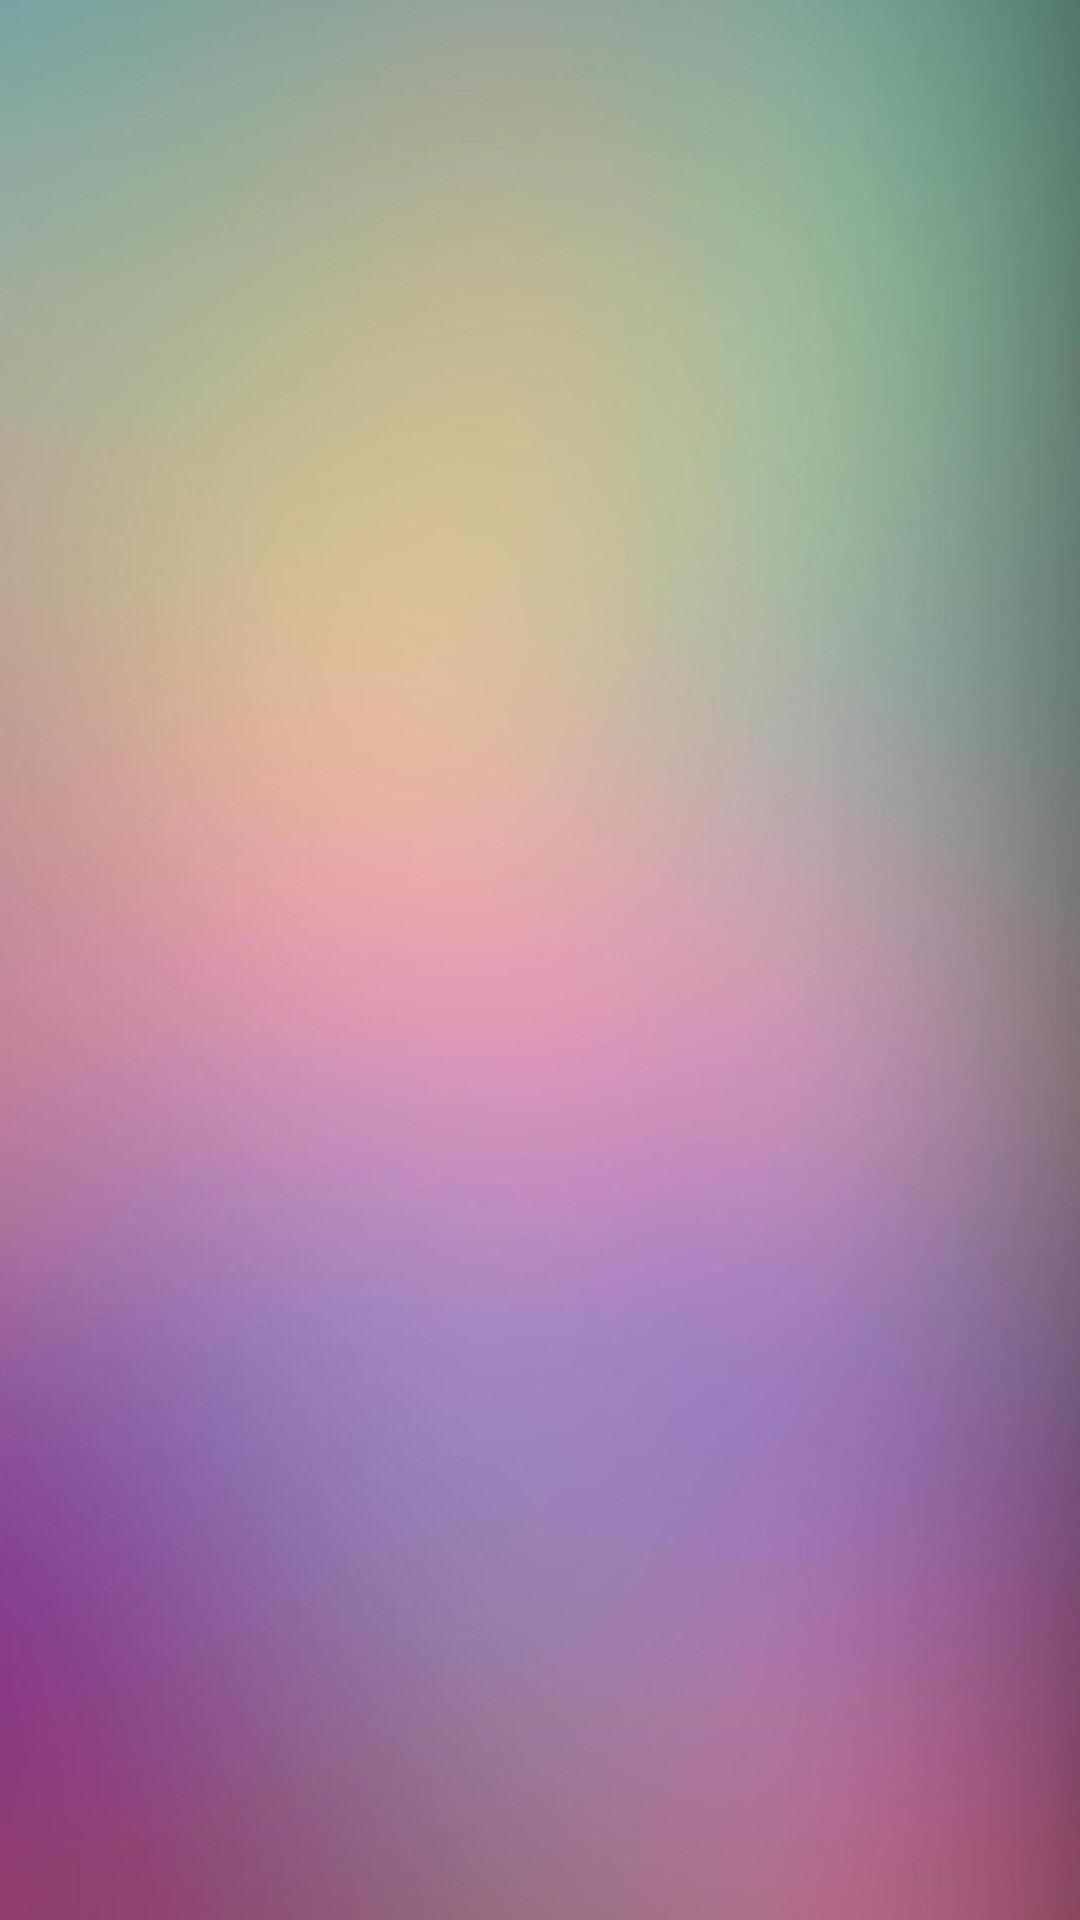 Nicki Minaj Wallpaper Iphone 5 Gradient Background Tumblr 183 ① Download Free Amazing Full